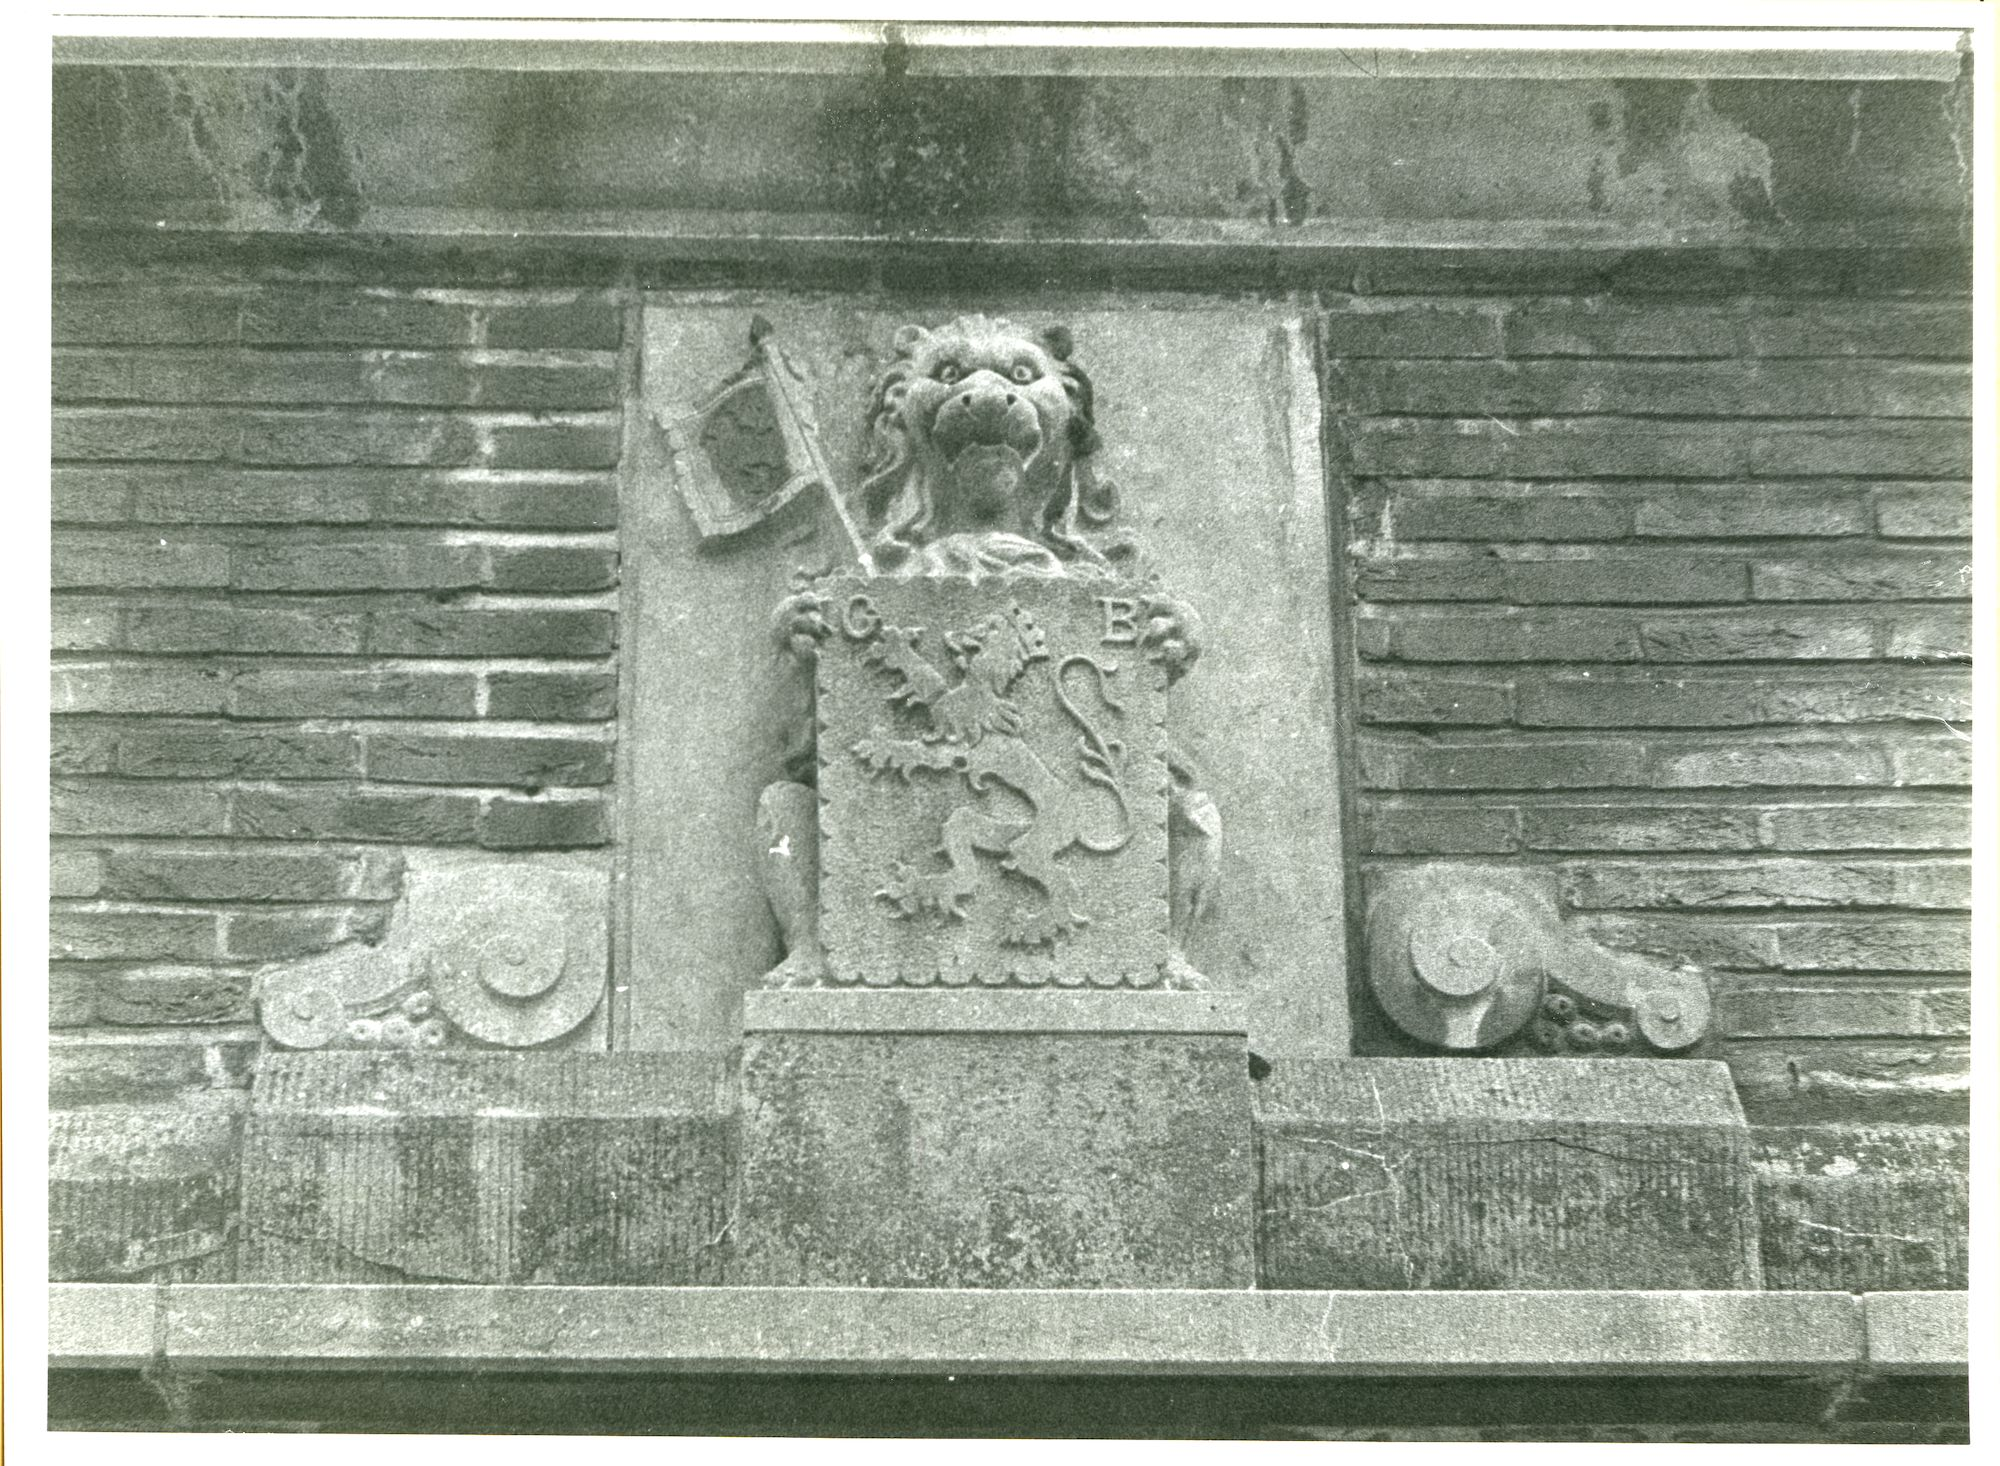 Gentbrugge: Tweekapellenstraat 19: Gevelbeeld, 1979